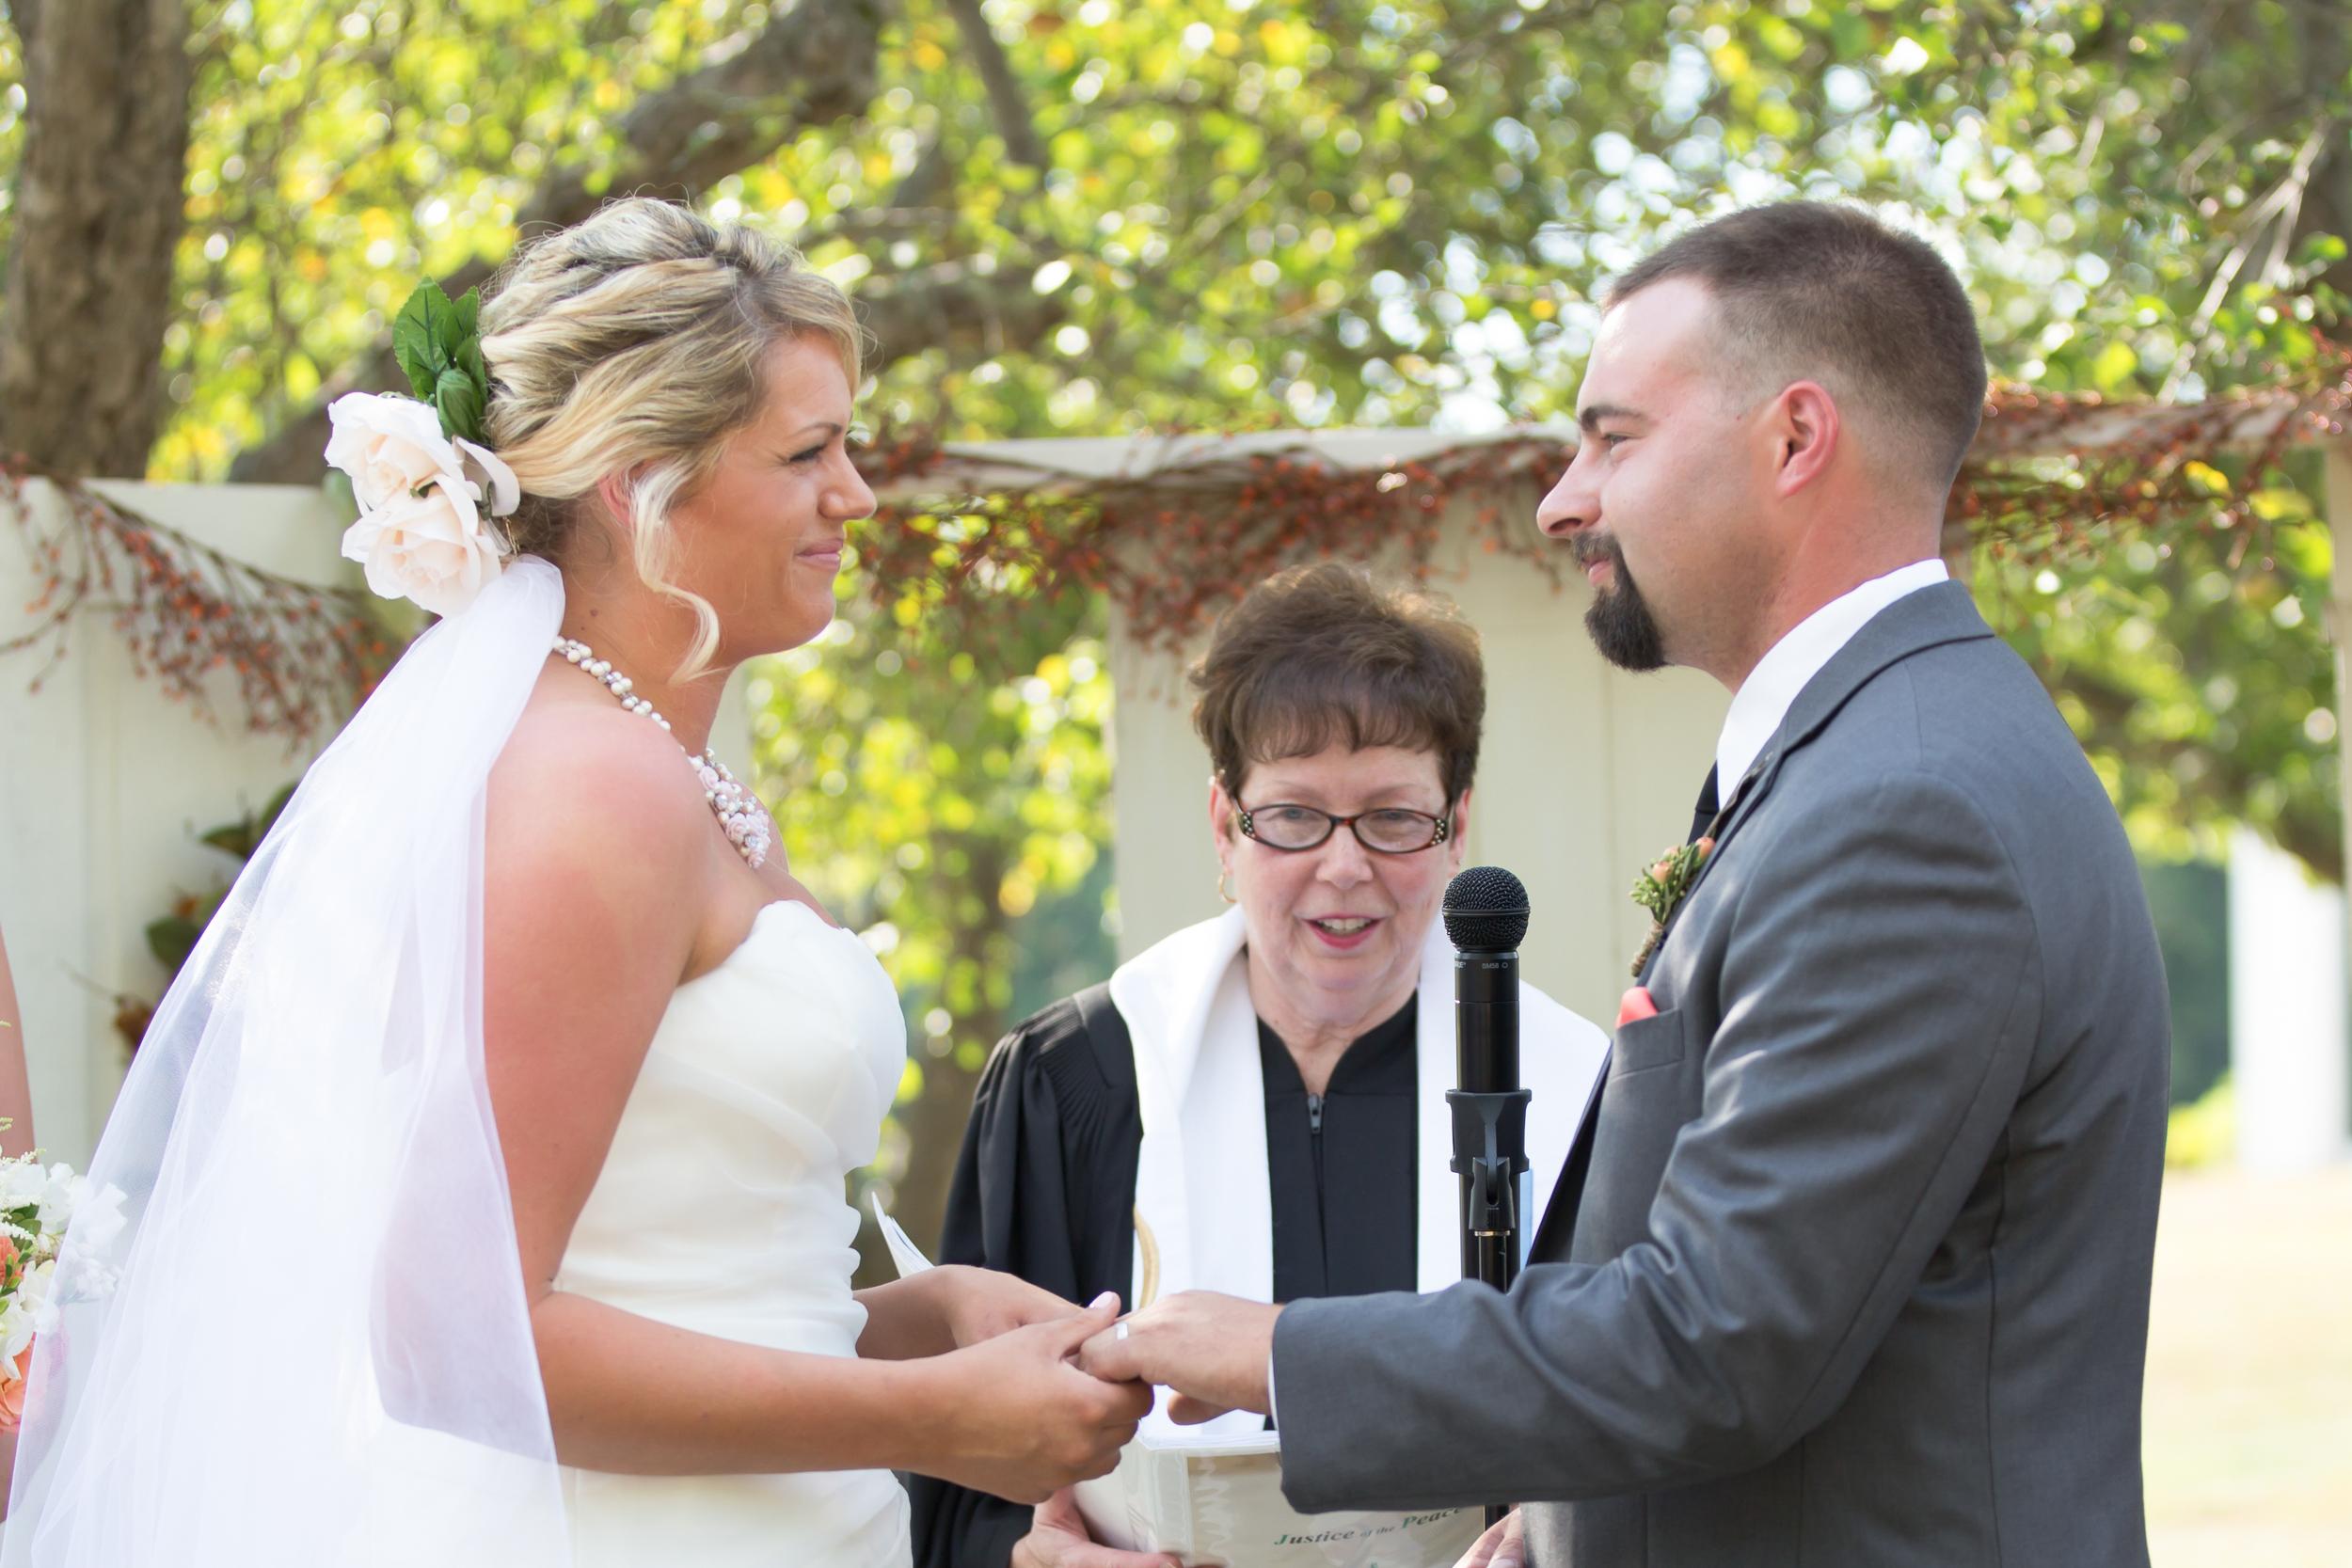 nh-wedding-photographer-amy-brown-photography-0425.JPG